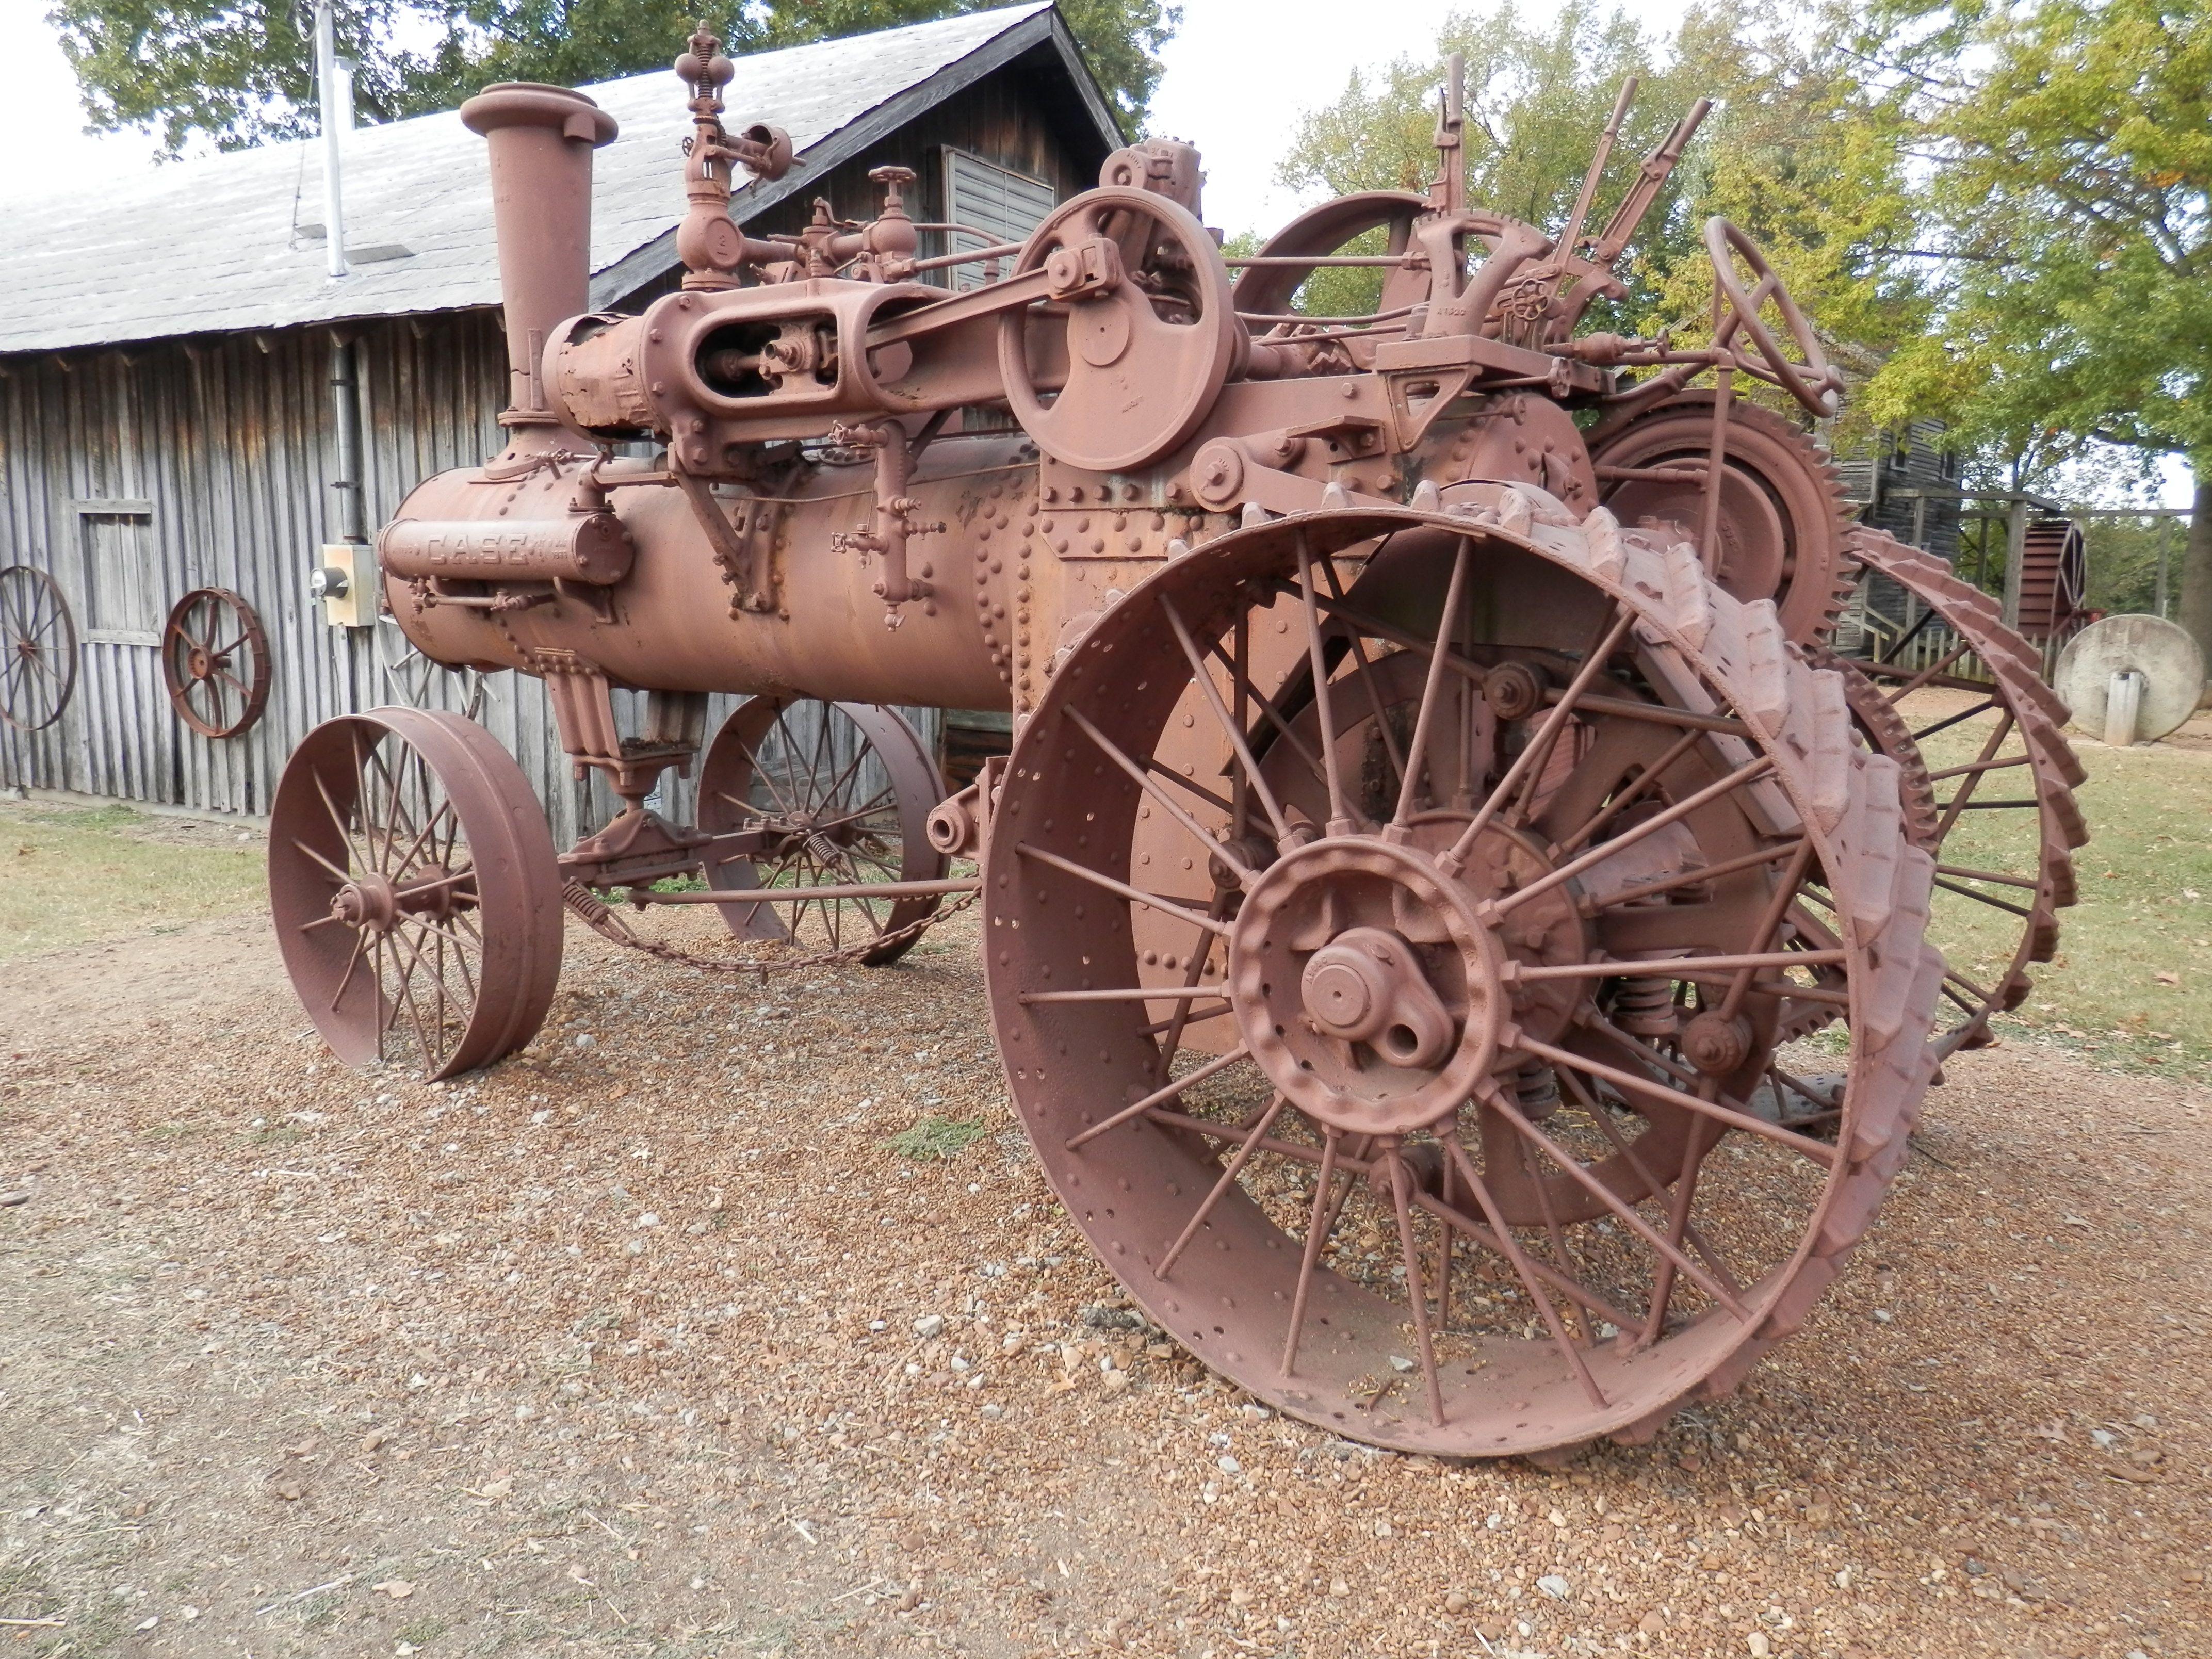 VIntage 1890's Case Steam Driven tractor - Cannonsburgh Village, Murfreesboro - October 2016